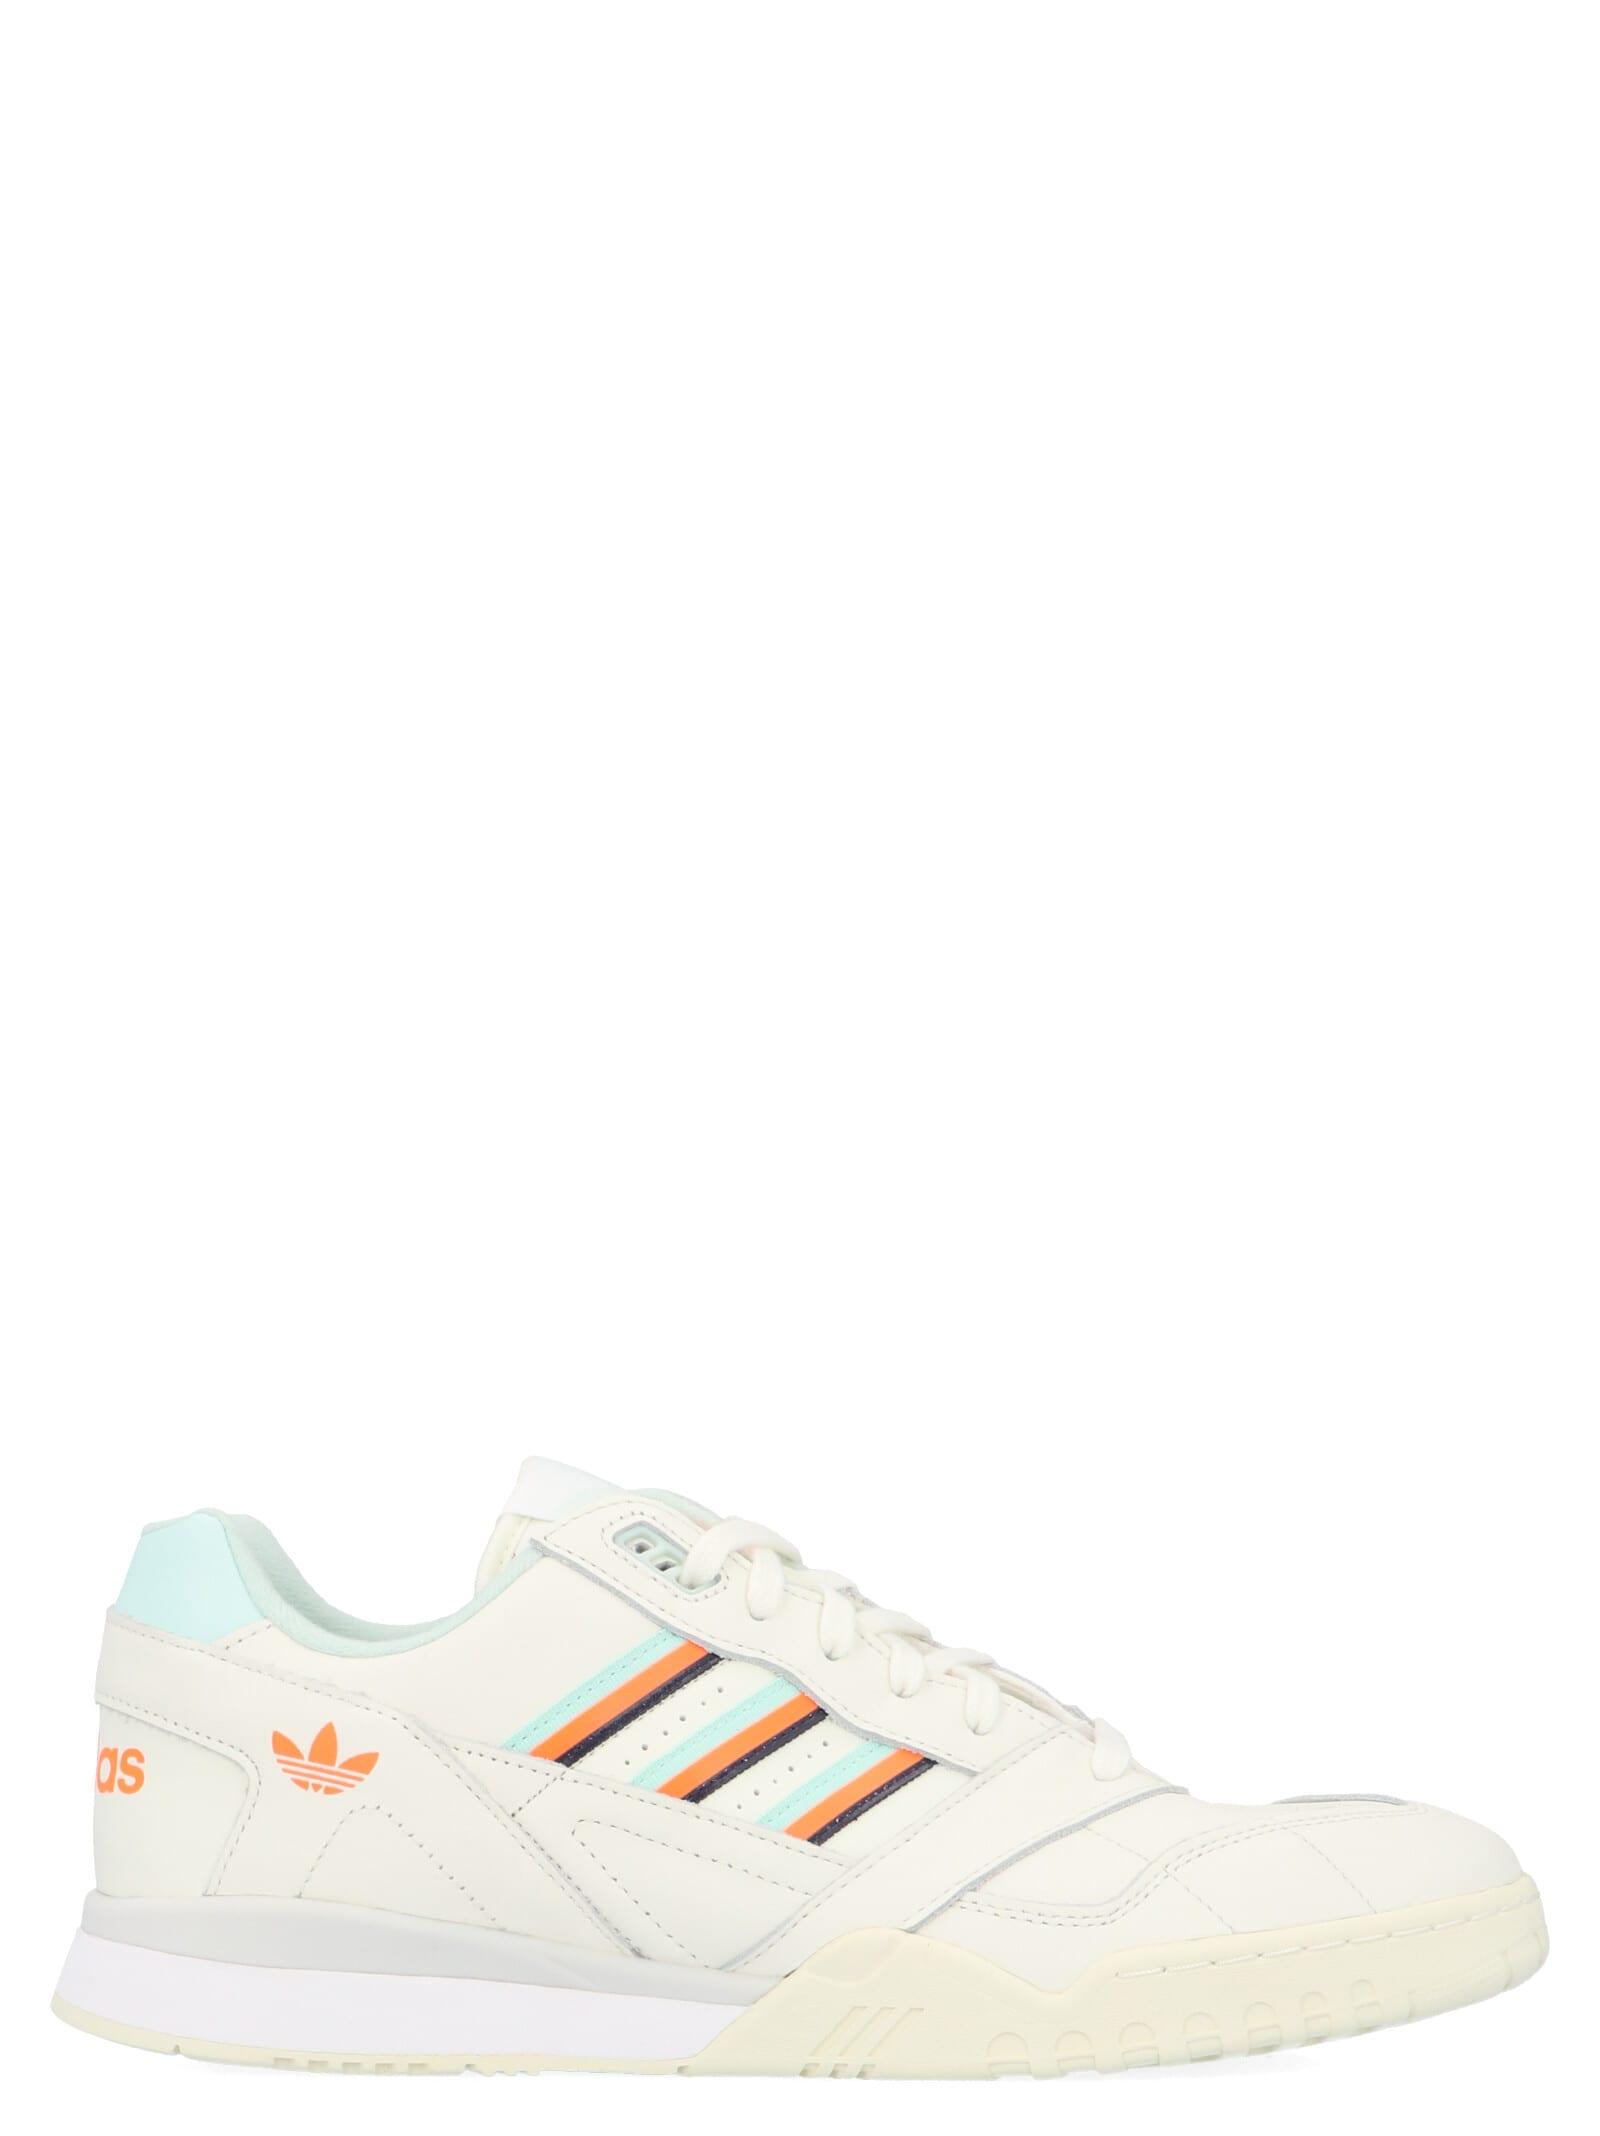 Best price on the market at italist | Adidas Originals Adidas Originals 'a.r.trainer' Shoes